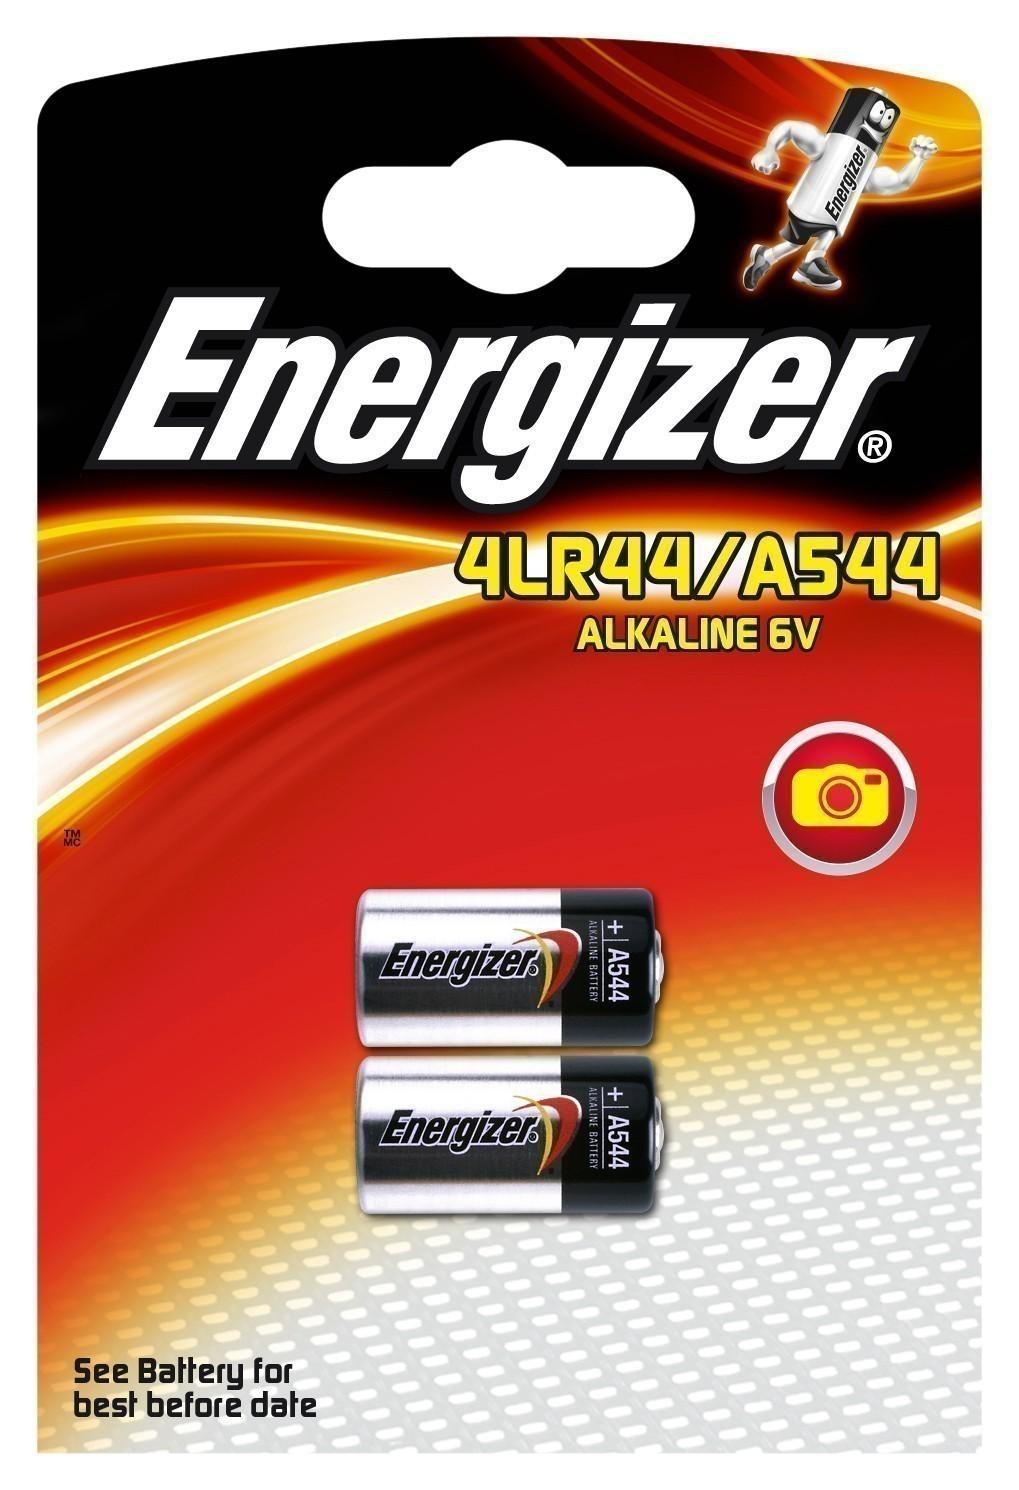 Energizer Spezialbatterie A544 Alkali Mangan 2 Stück Bild 1